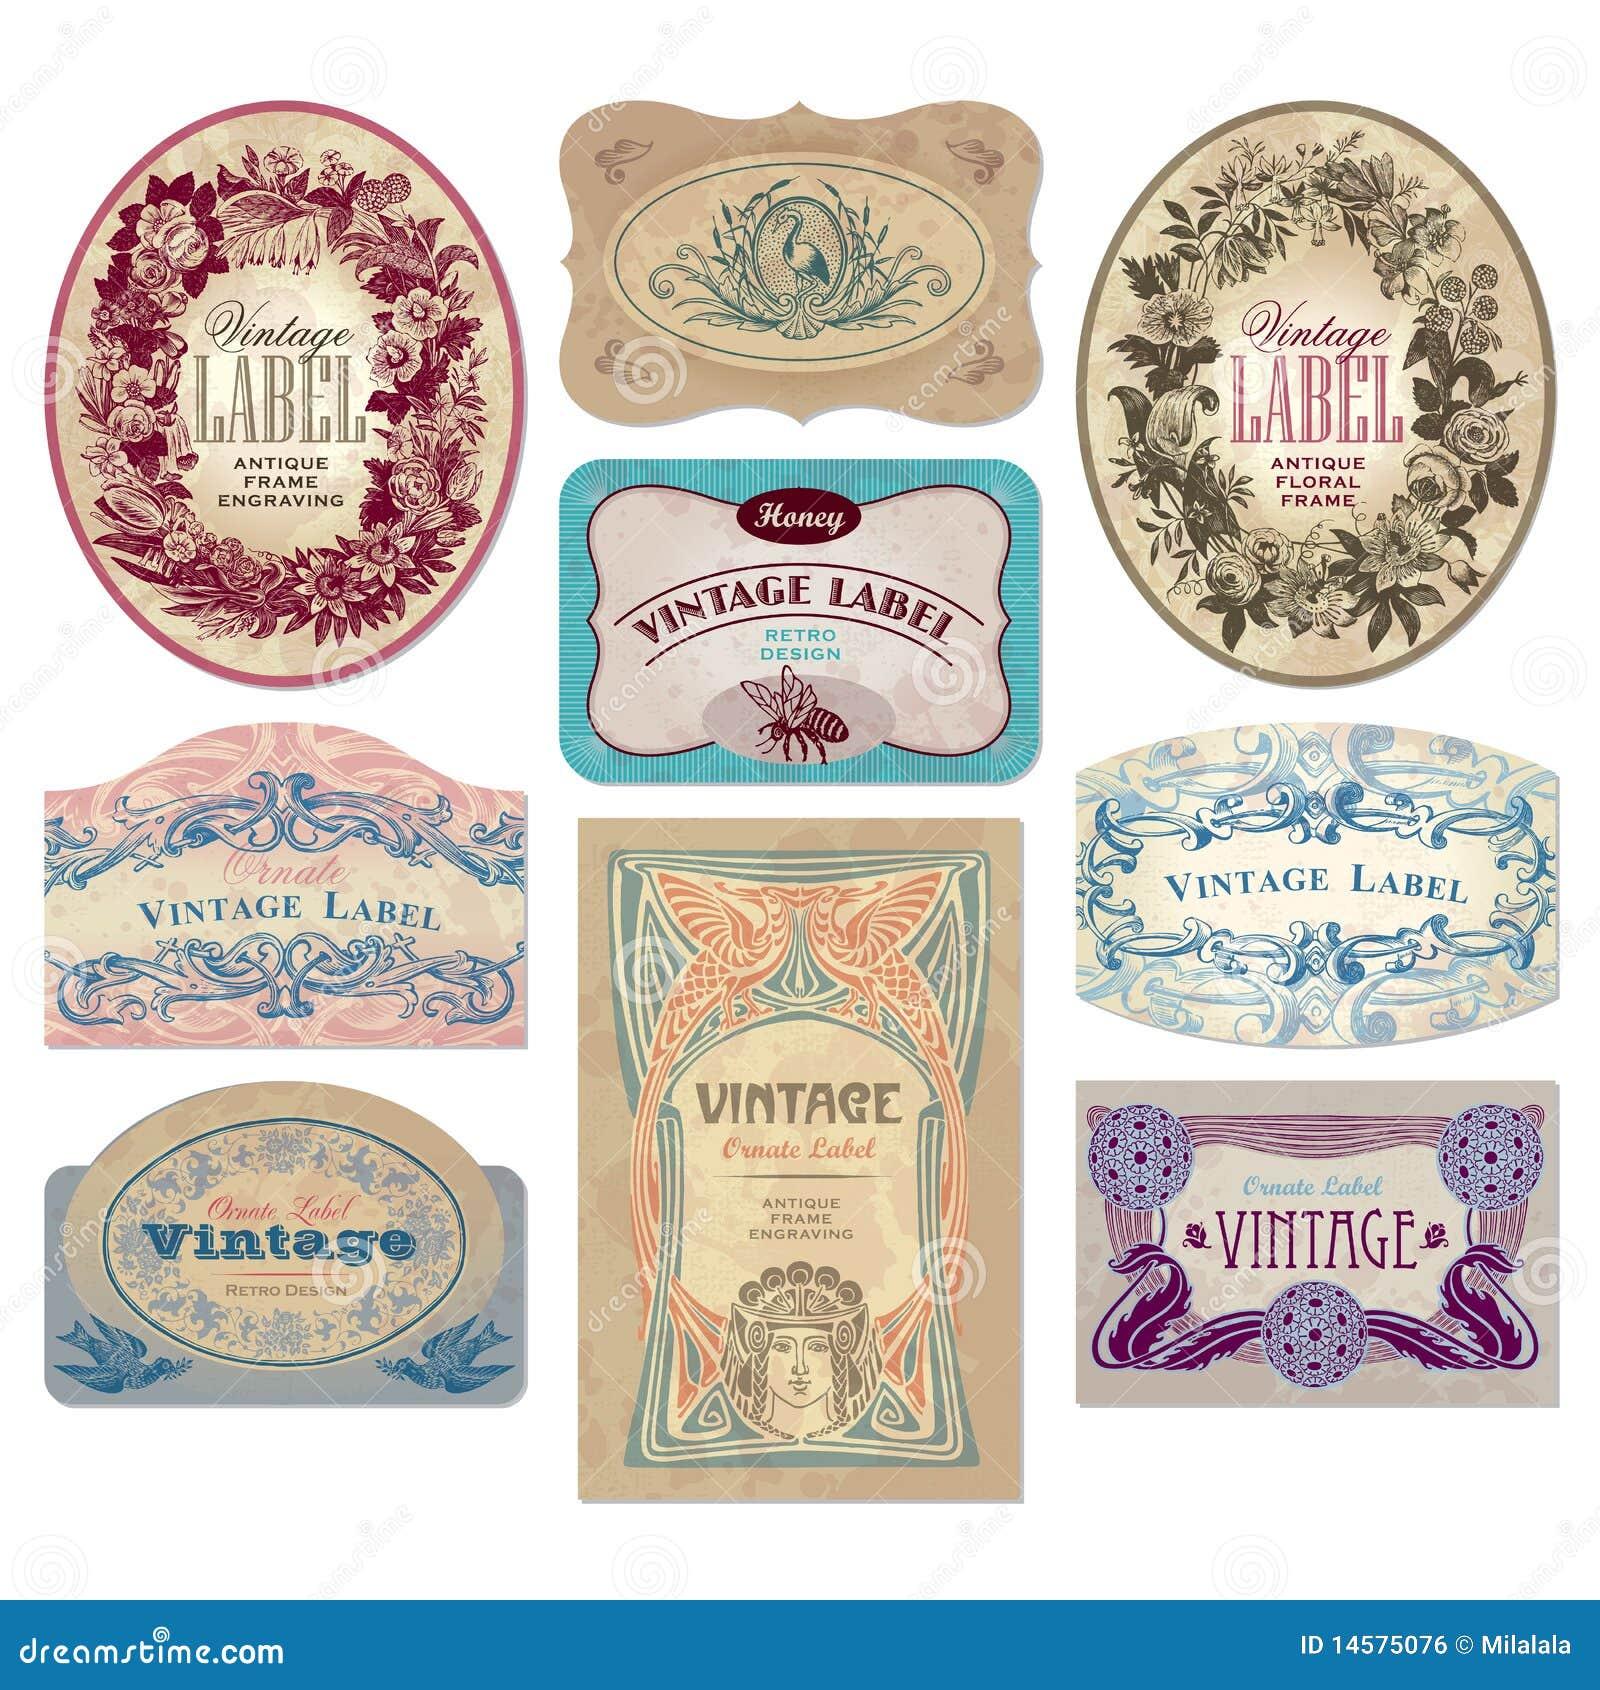 Vintage Labels Set (vector) Royalty Free Stock Image - Image: 14575076